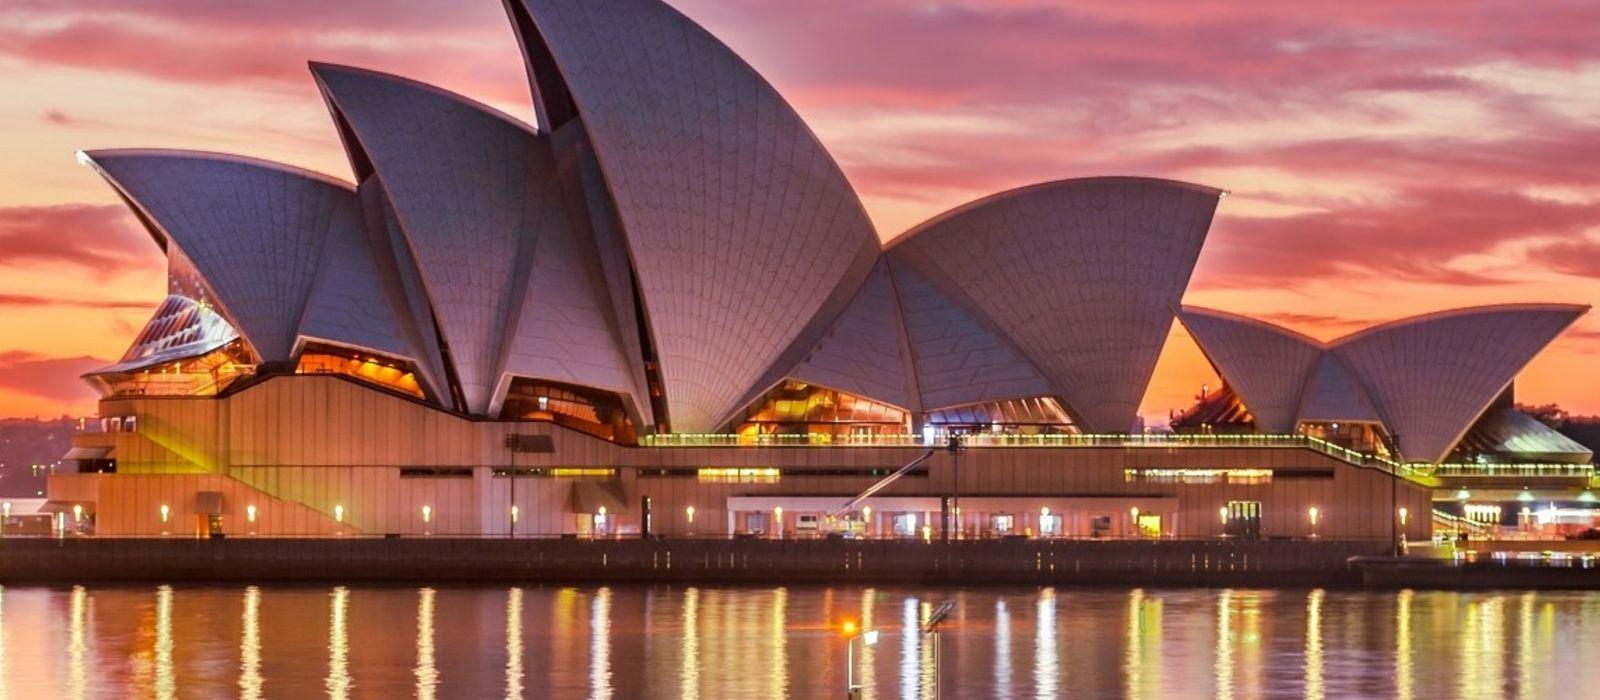 Australien: Großstadtleben & Great Barrier Reef Urlaub 1